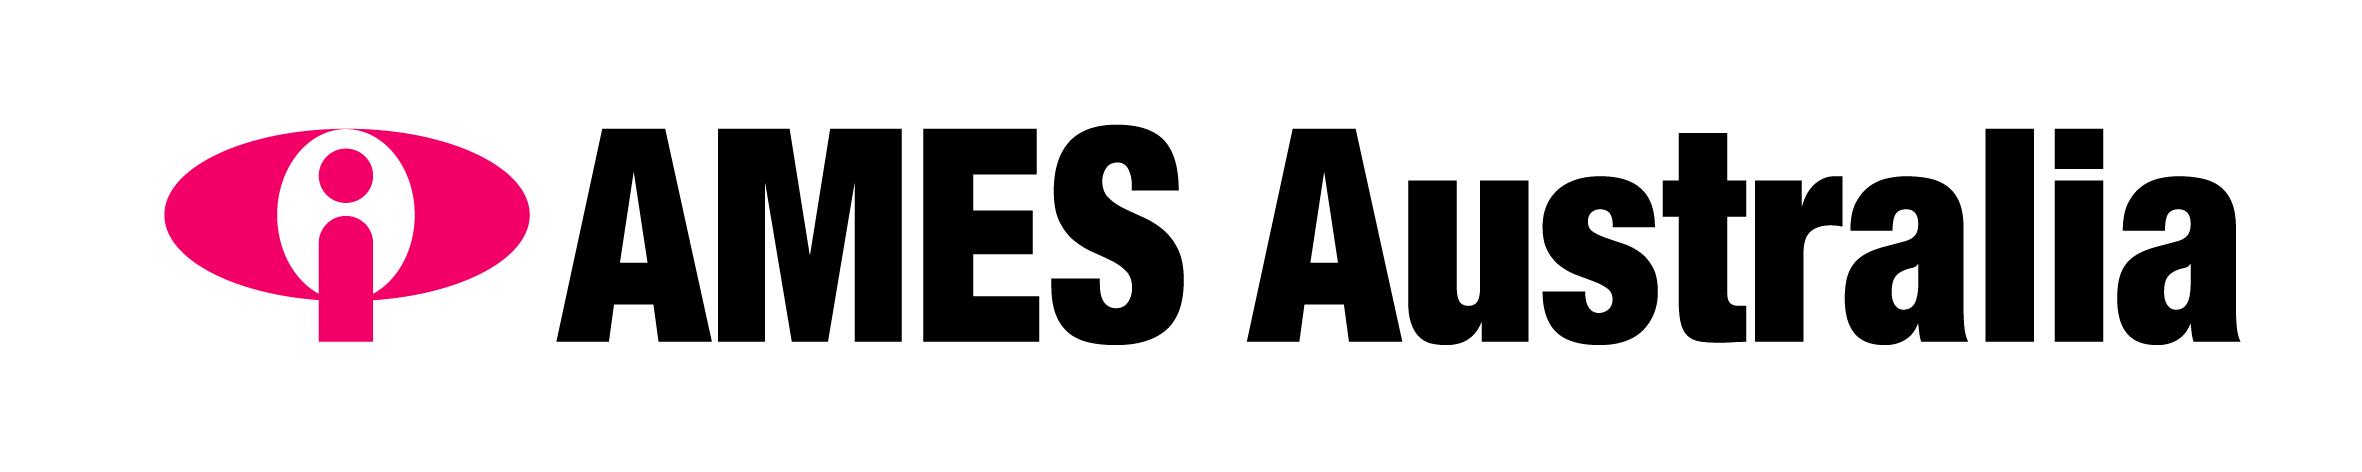 ames0007